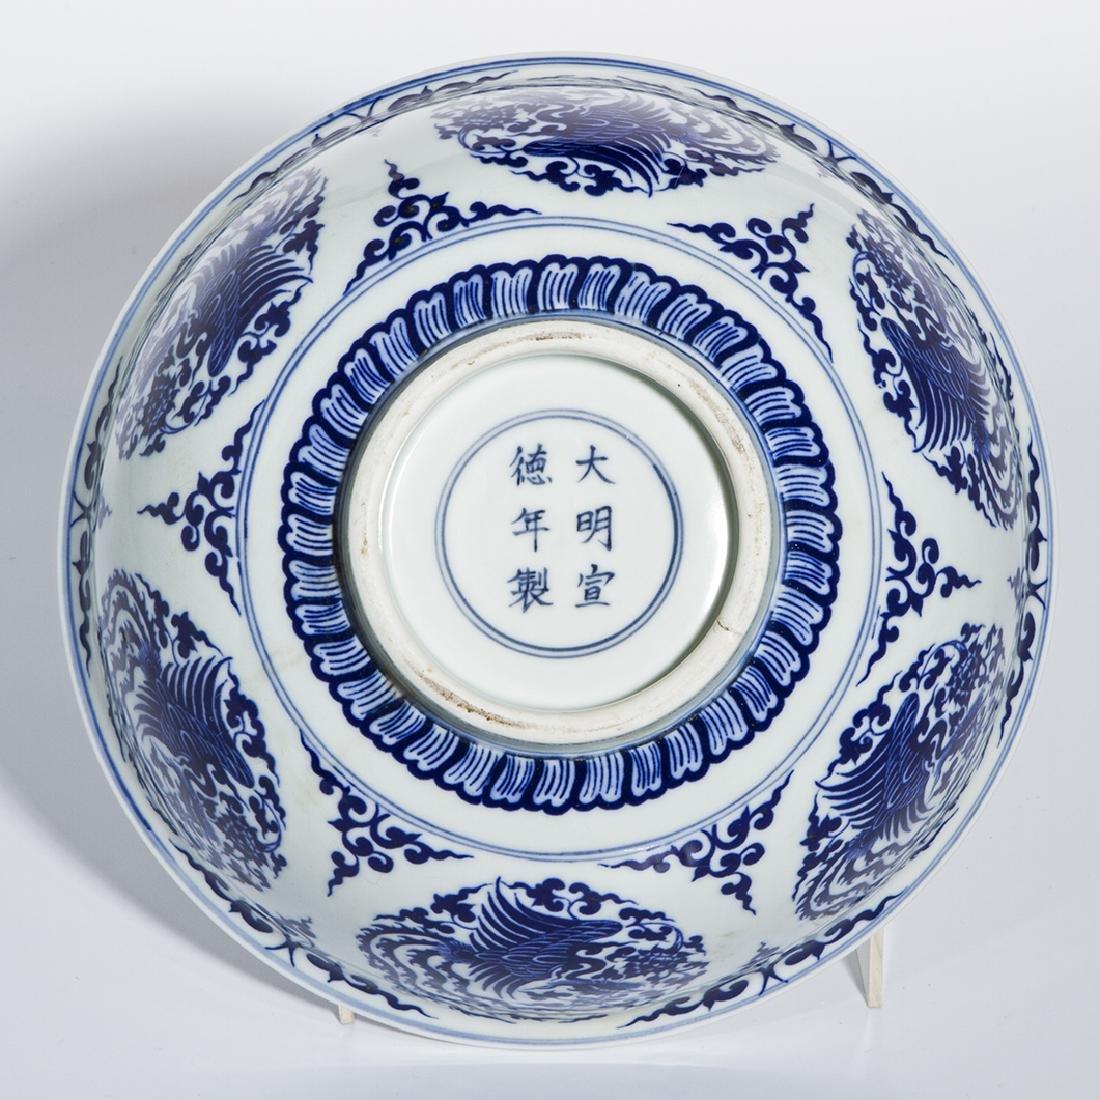 Chinese Blue and White 'Phoenix Medallion' Bowl - 8